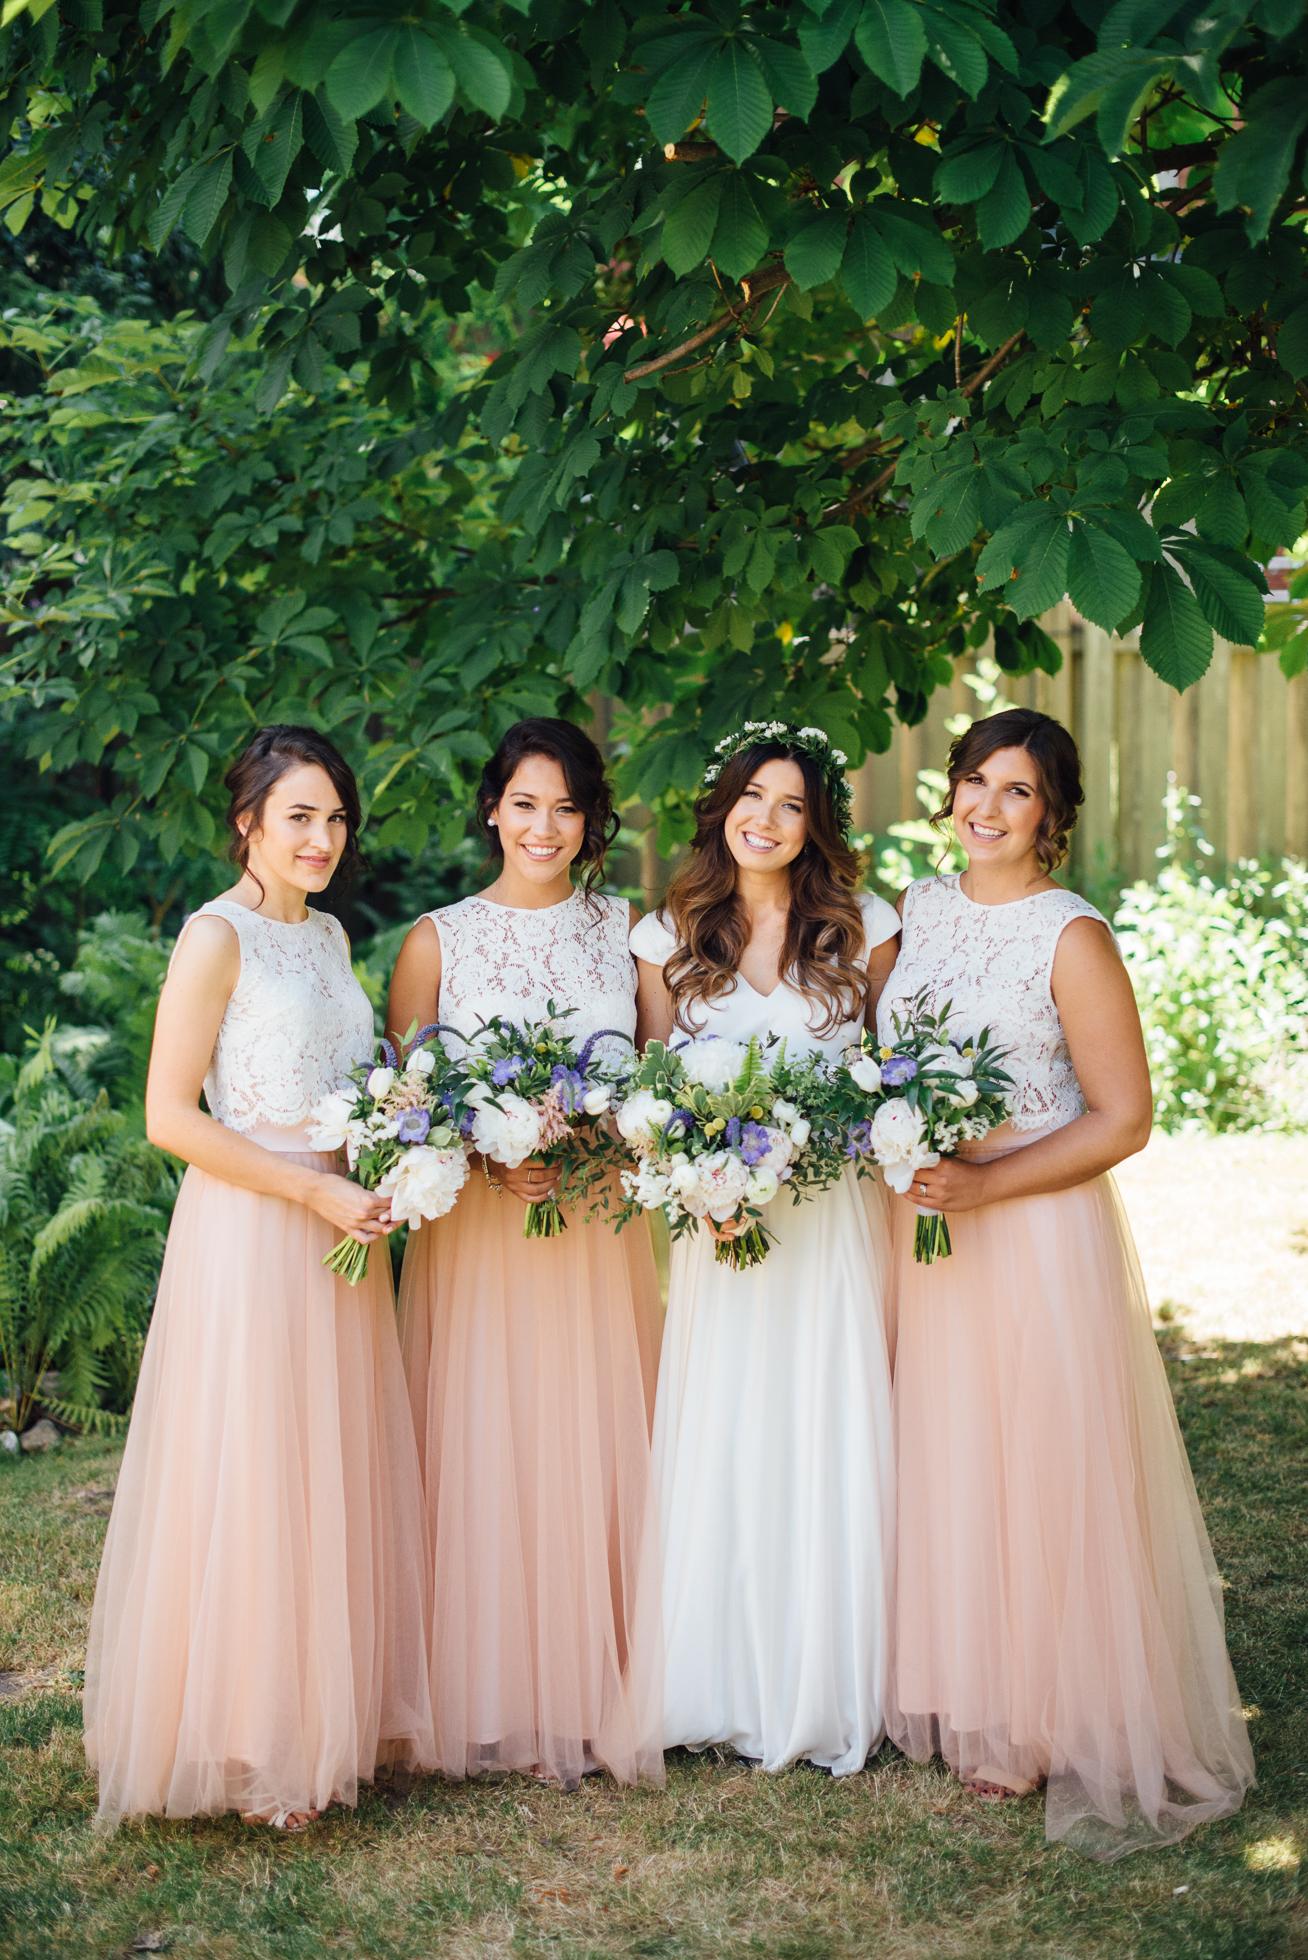 Downswell-Barn-Wedding-Photography-20.jpg